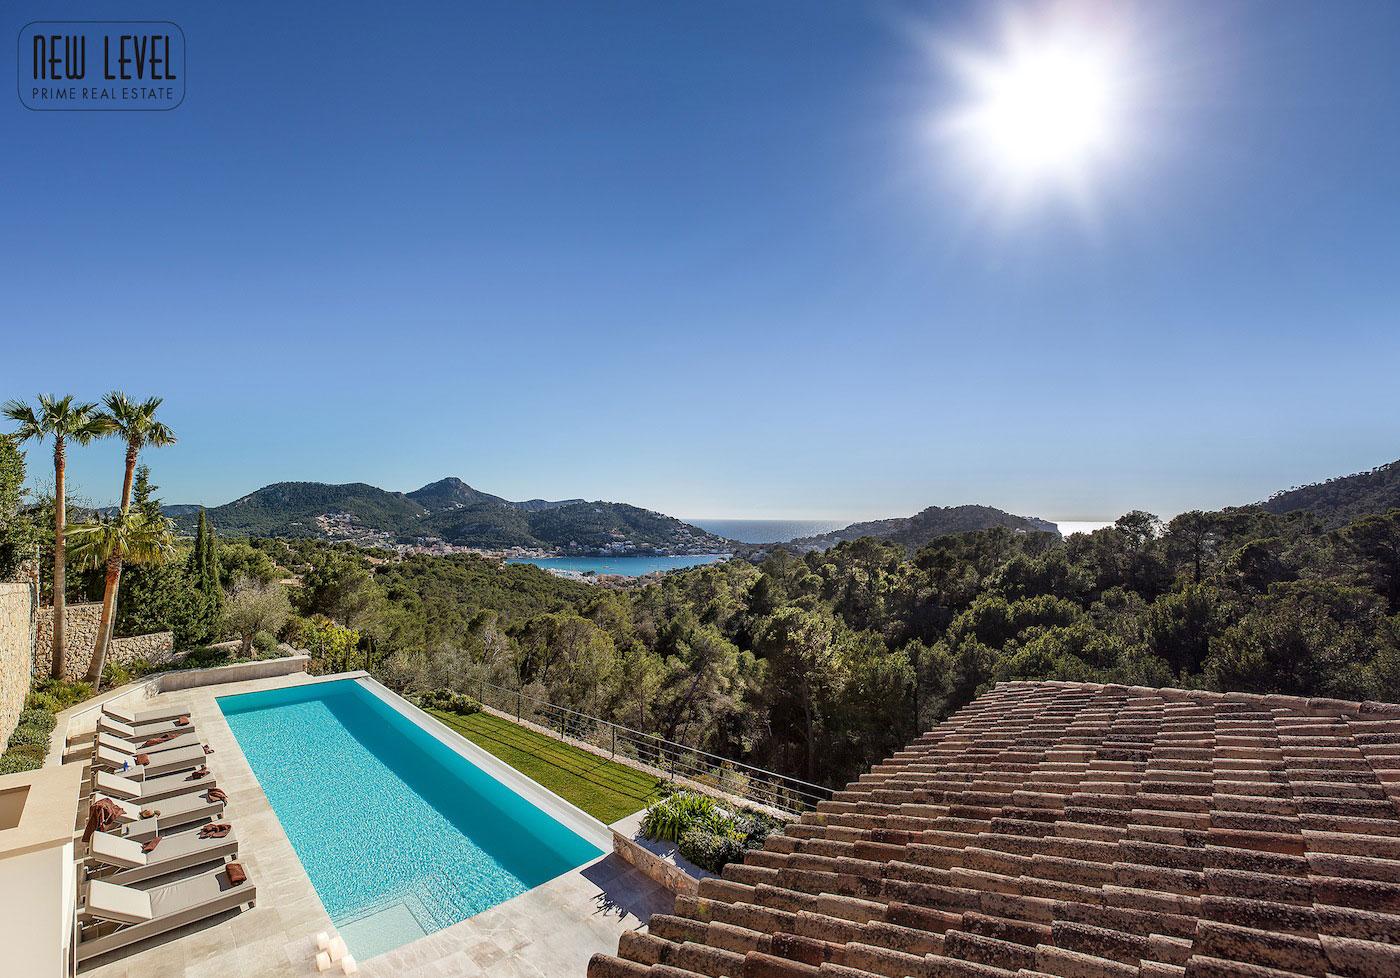 Pool, Terrace, Fabulous Villa in Puerto de Andratx, Mallorca